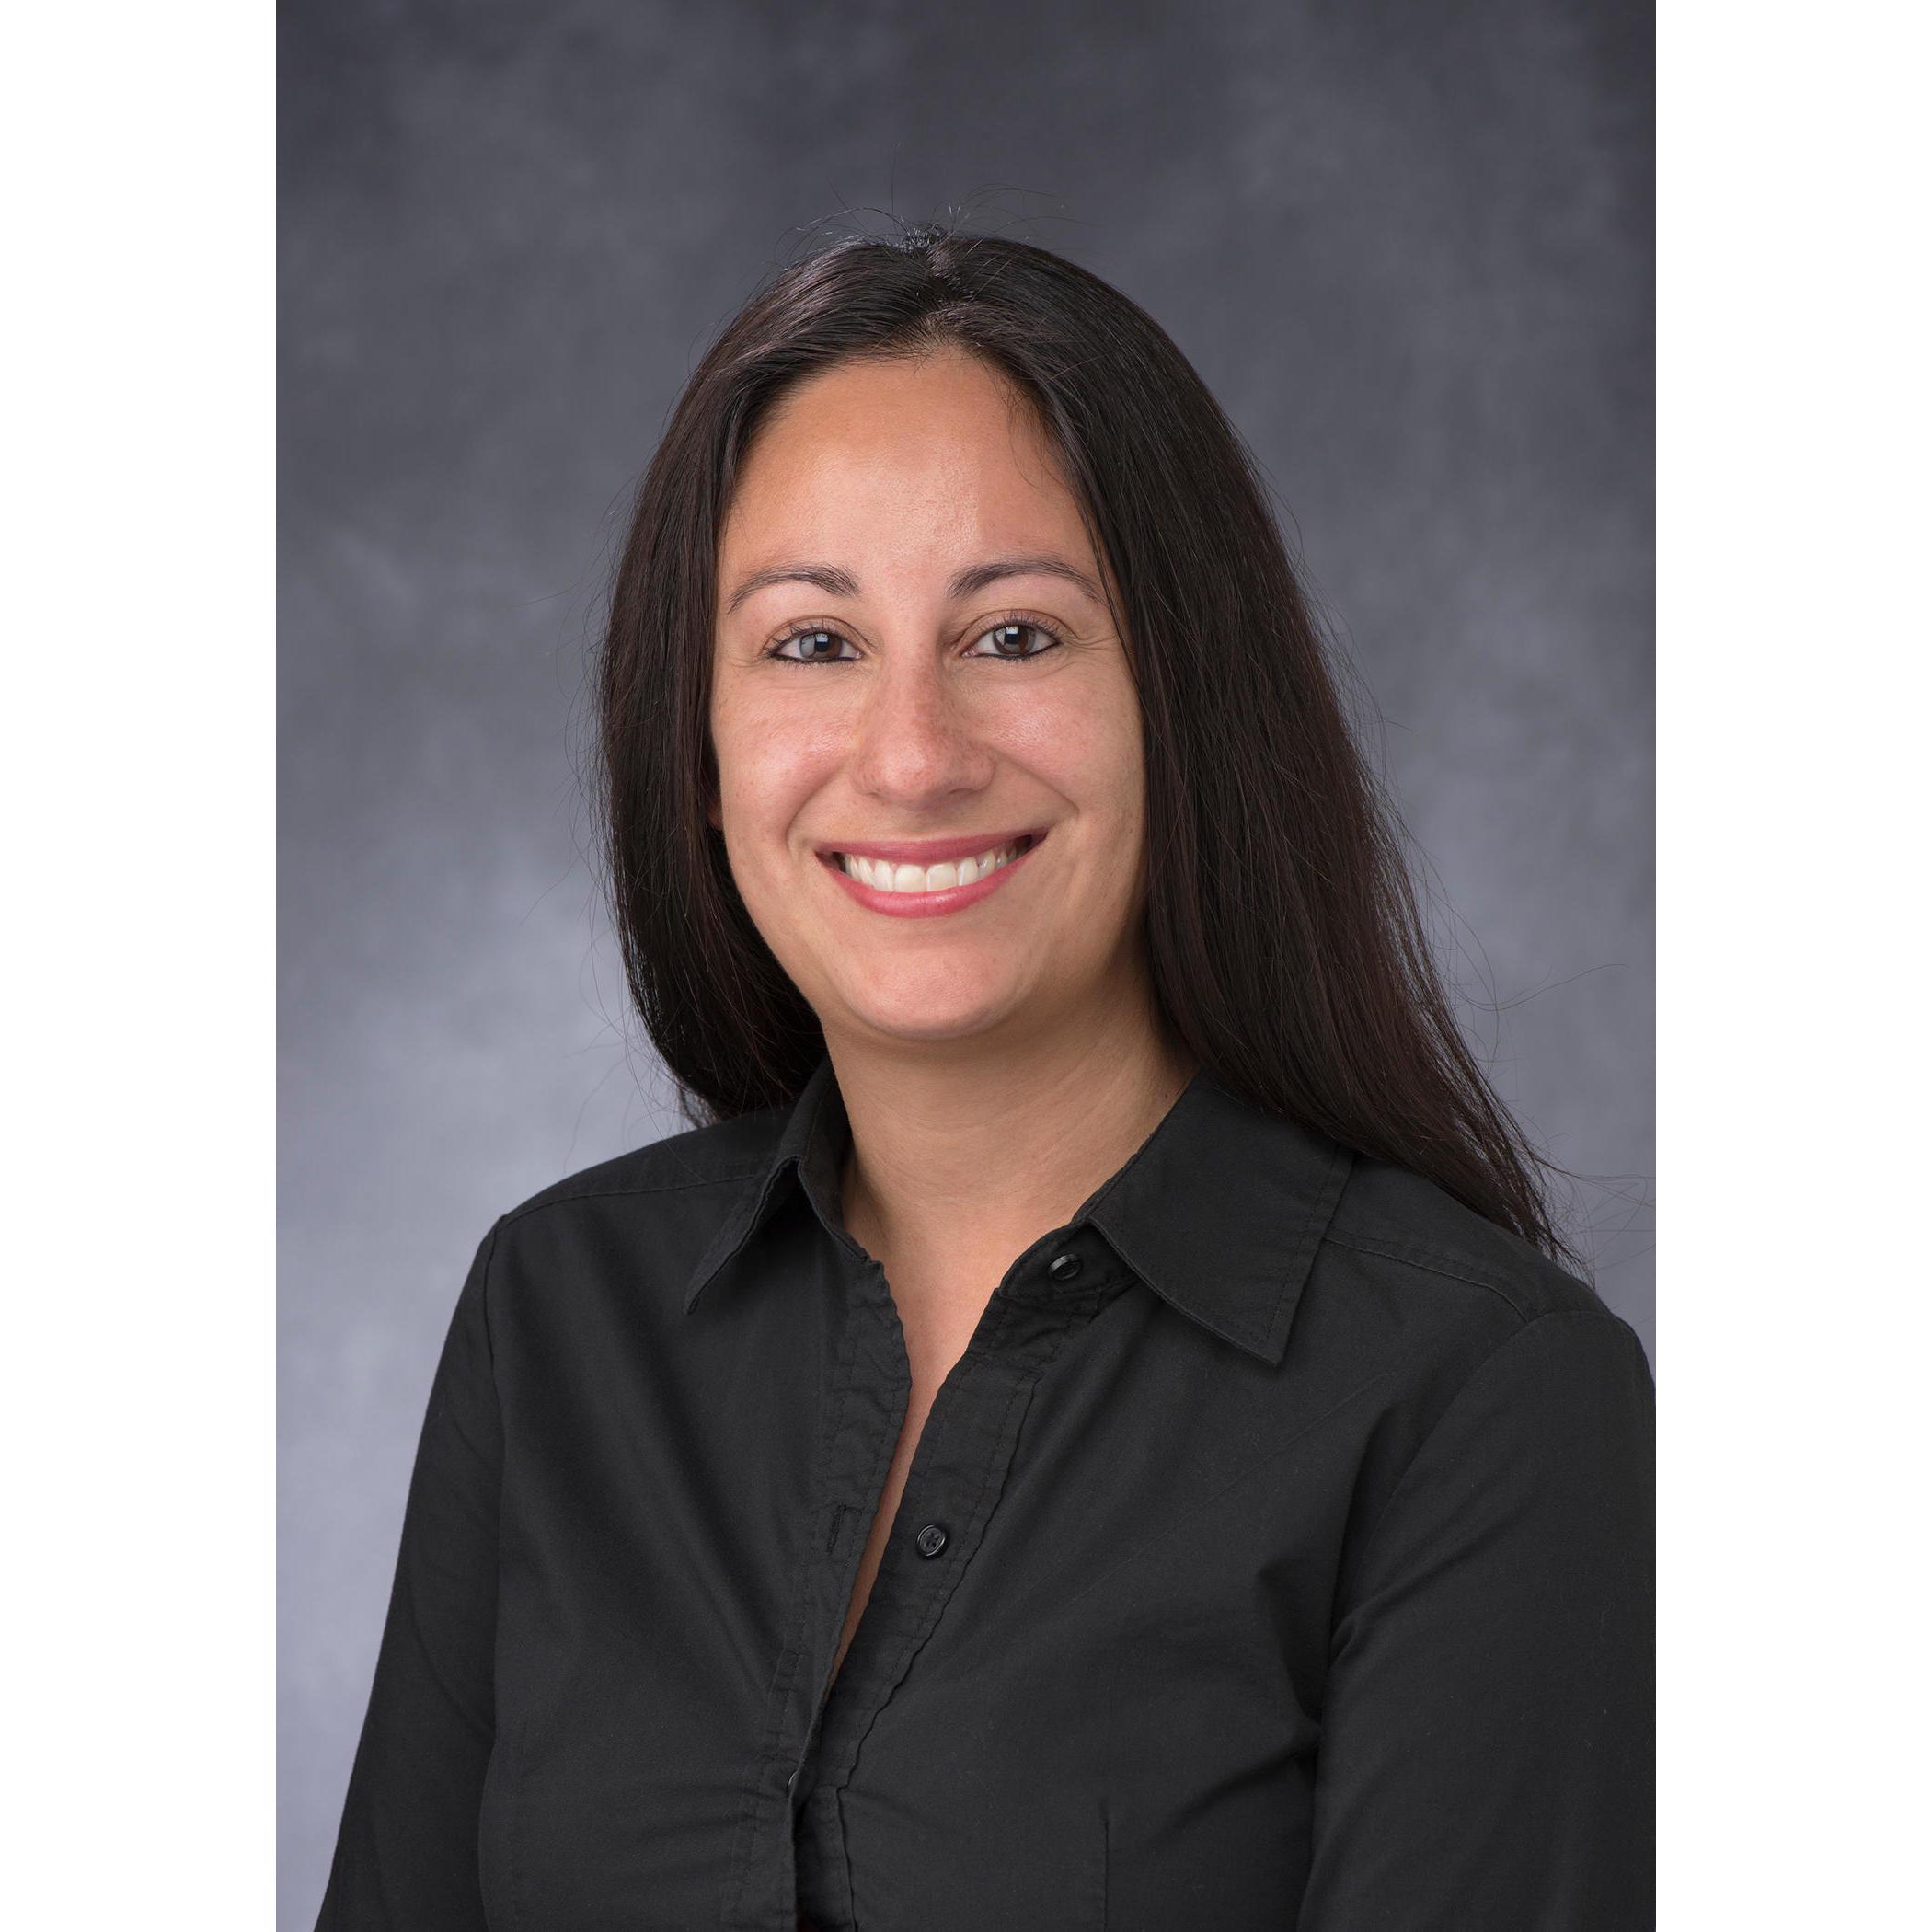 Sarahjeet Singh - Tempe, AZ - General or Family Practice Physicians